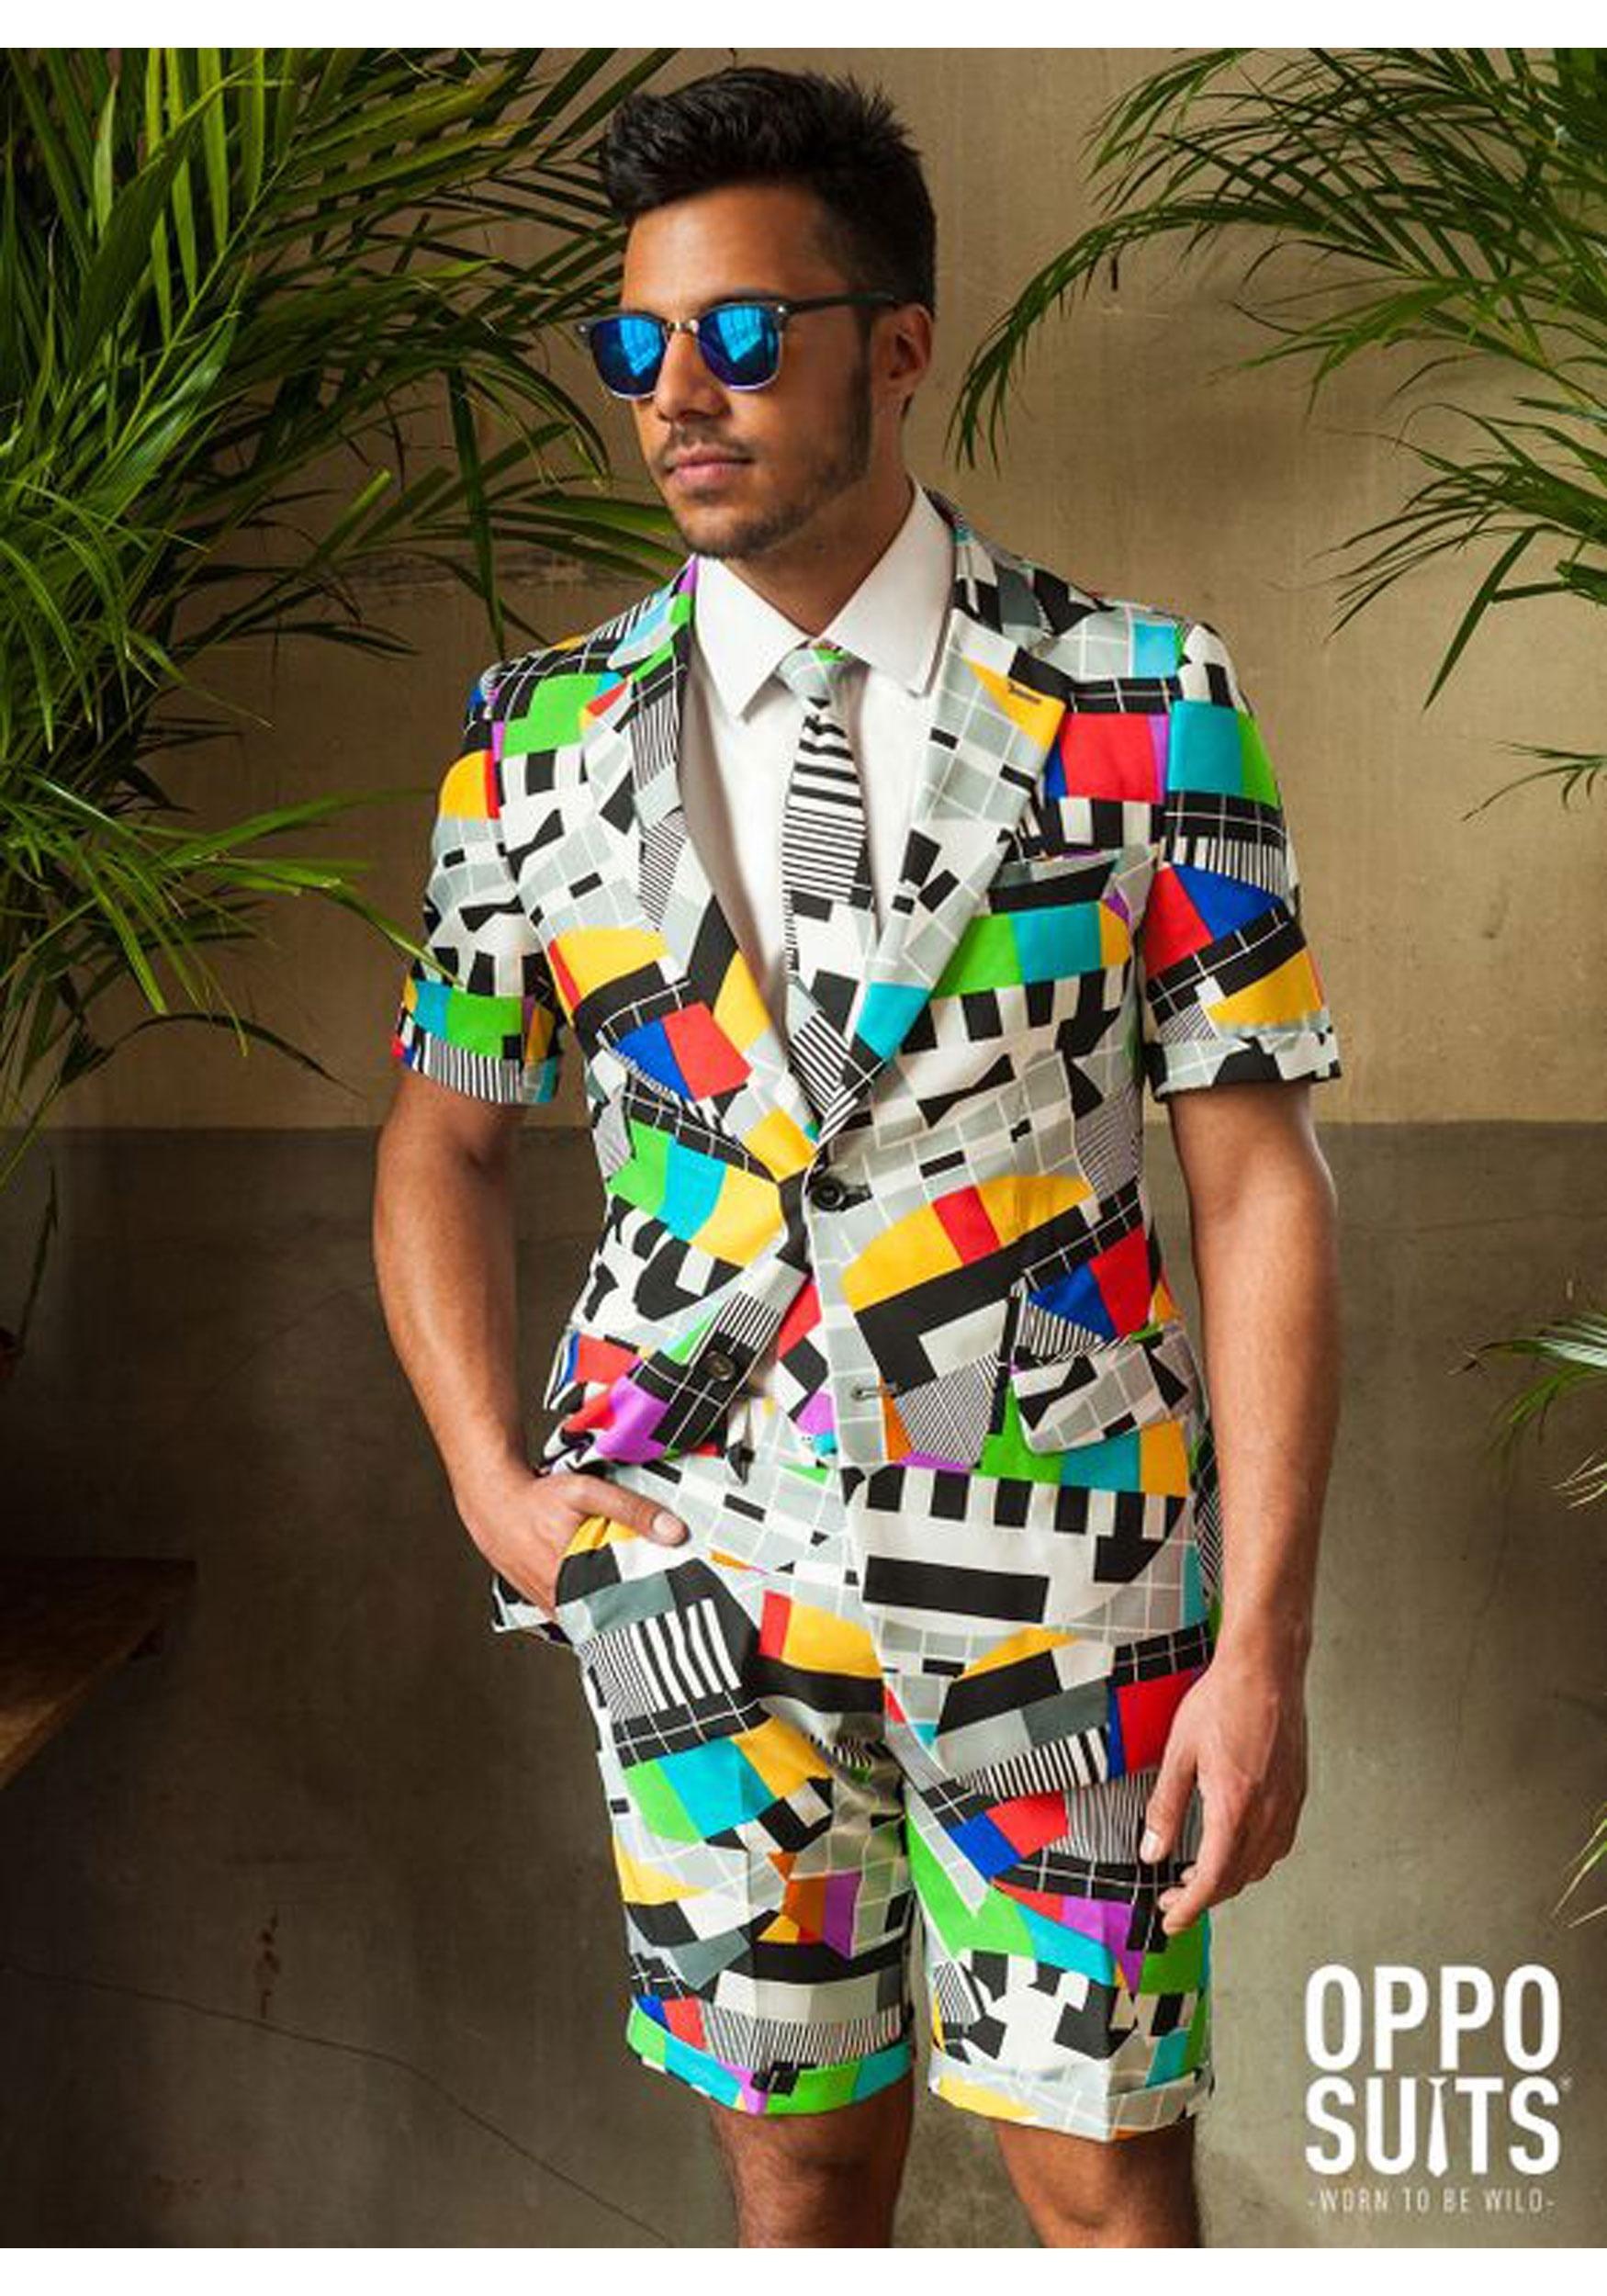 Opposuits Testival Summer Suit Men S Costume